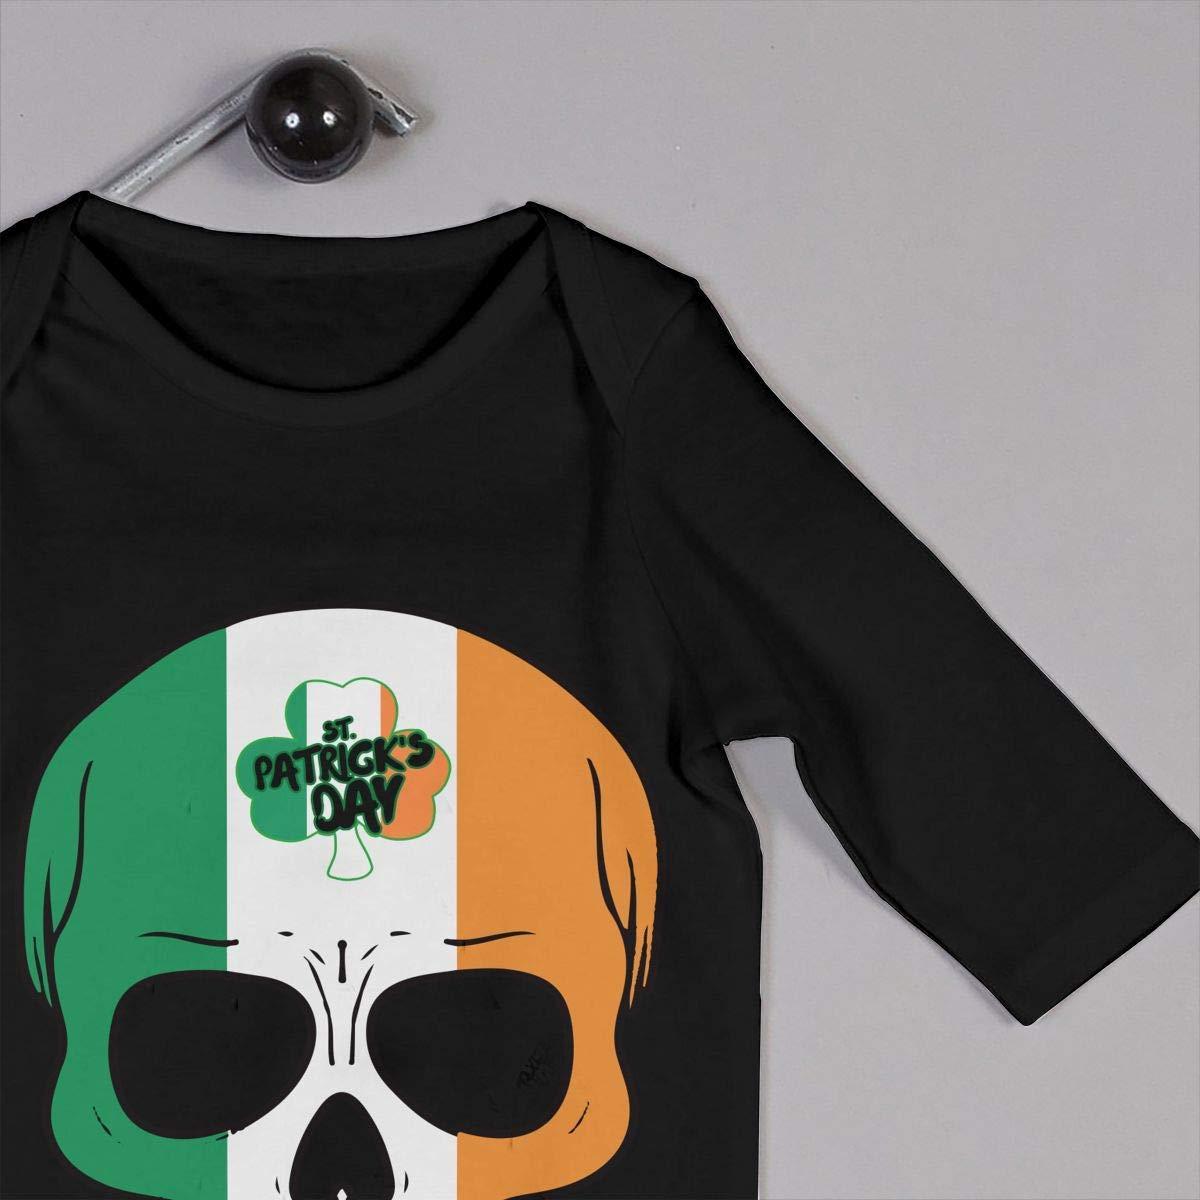 Patricks Day Toddler Jumpsuit TYLER DEAN Newborn Baby Long Sleeved Coveralls Irish Skull St